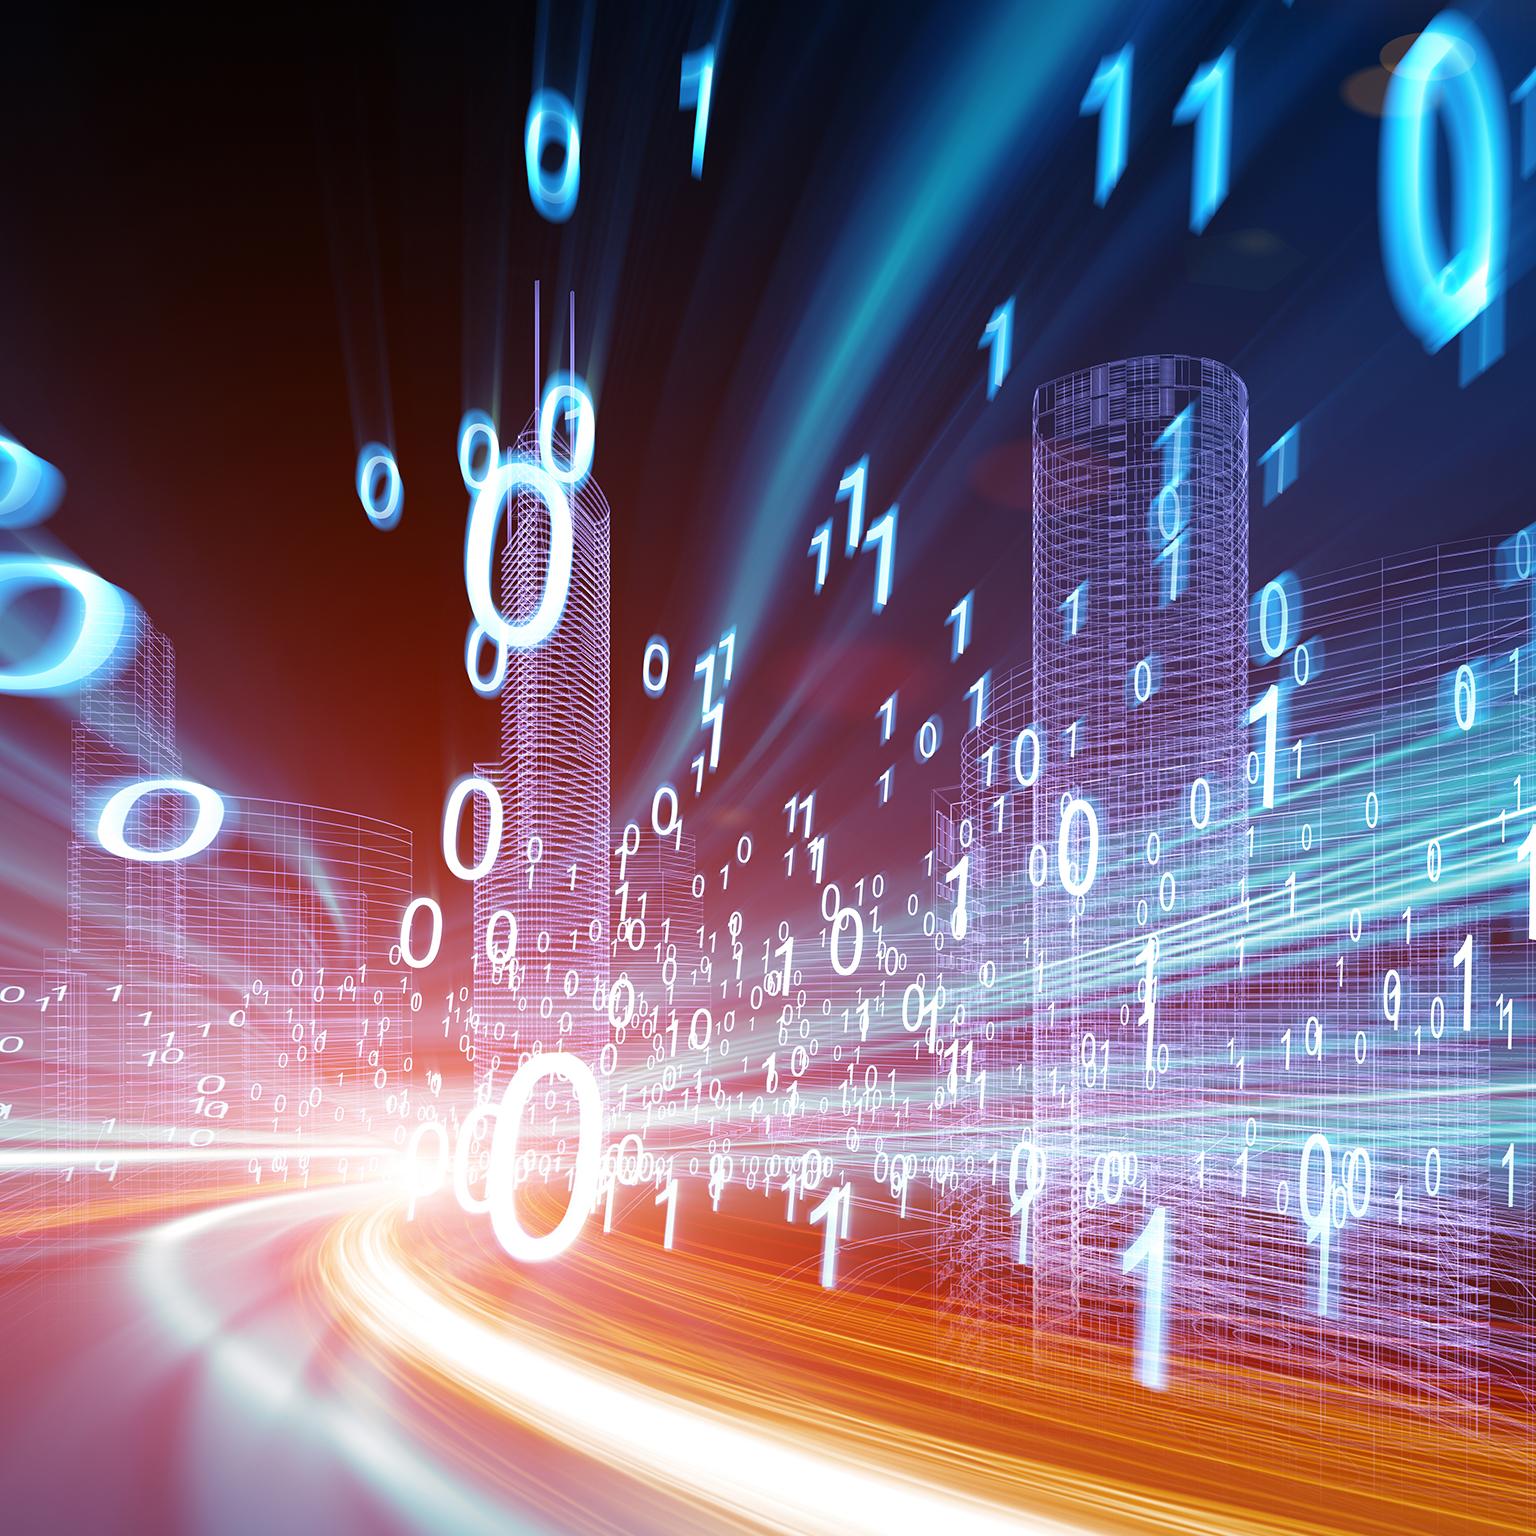 mckinsey.com - Smarter analytics for banks